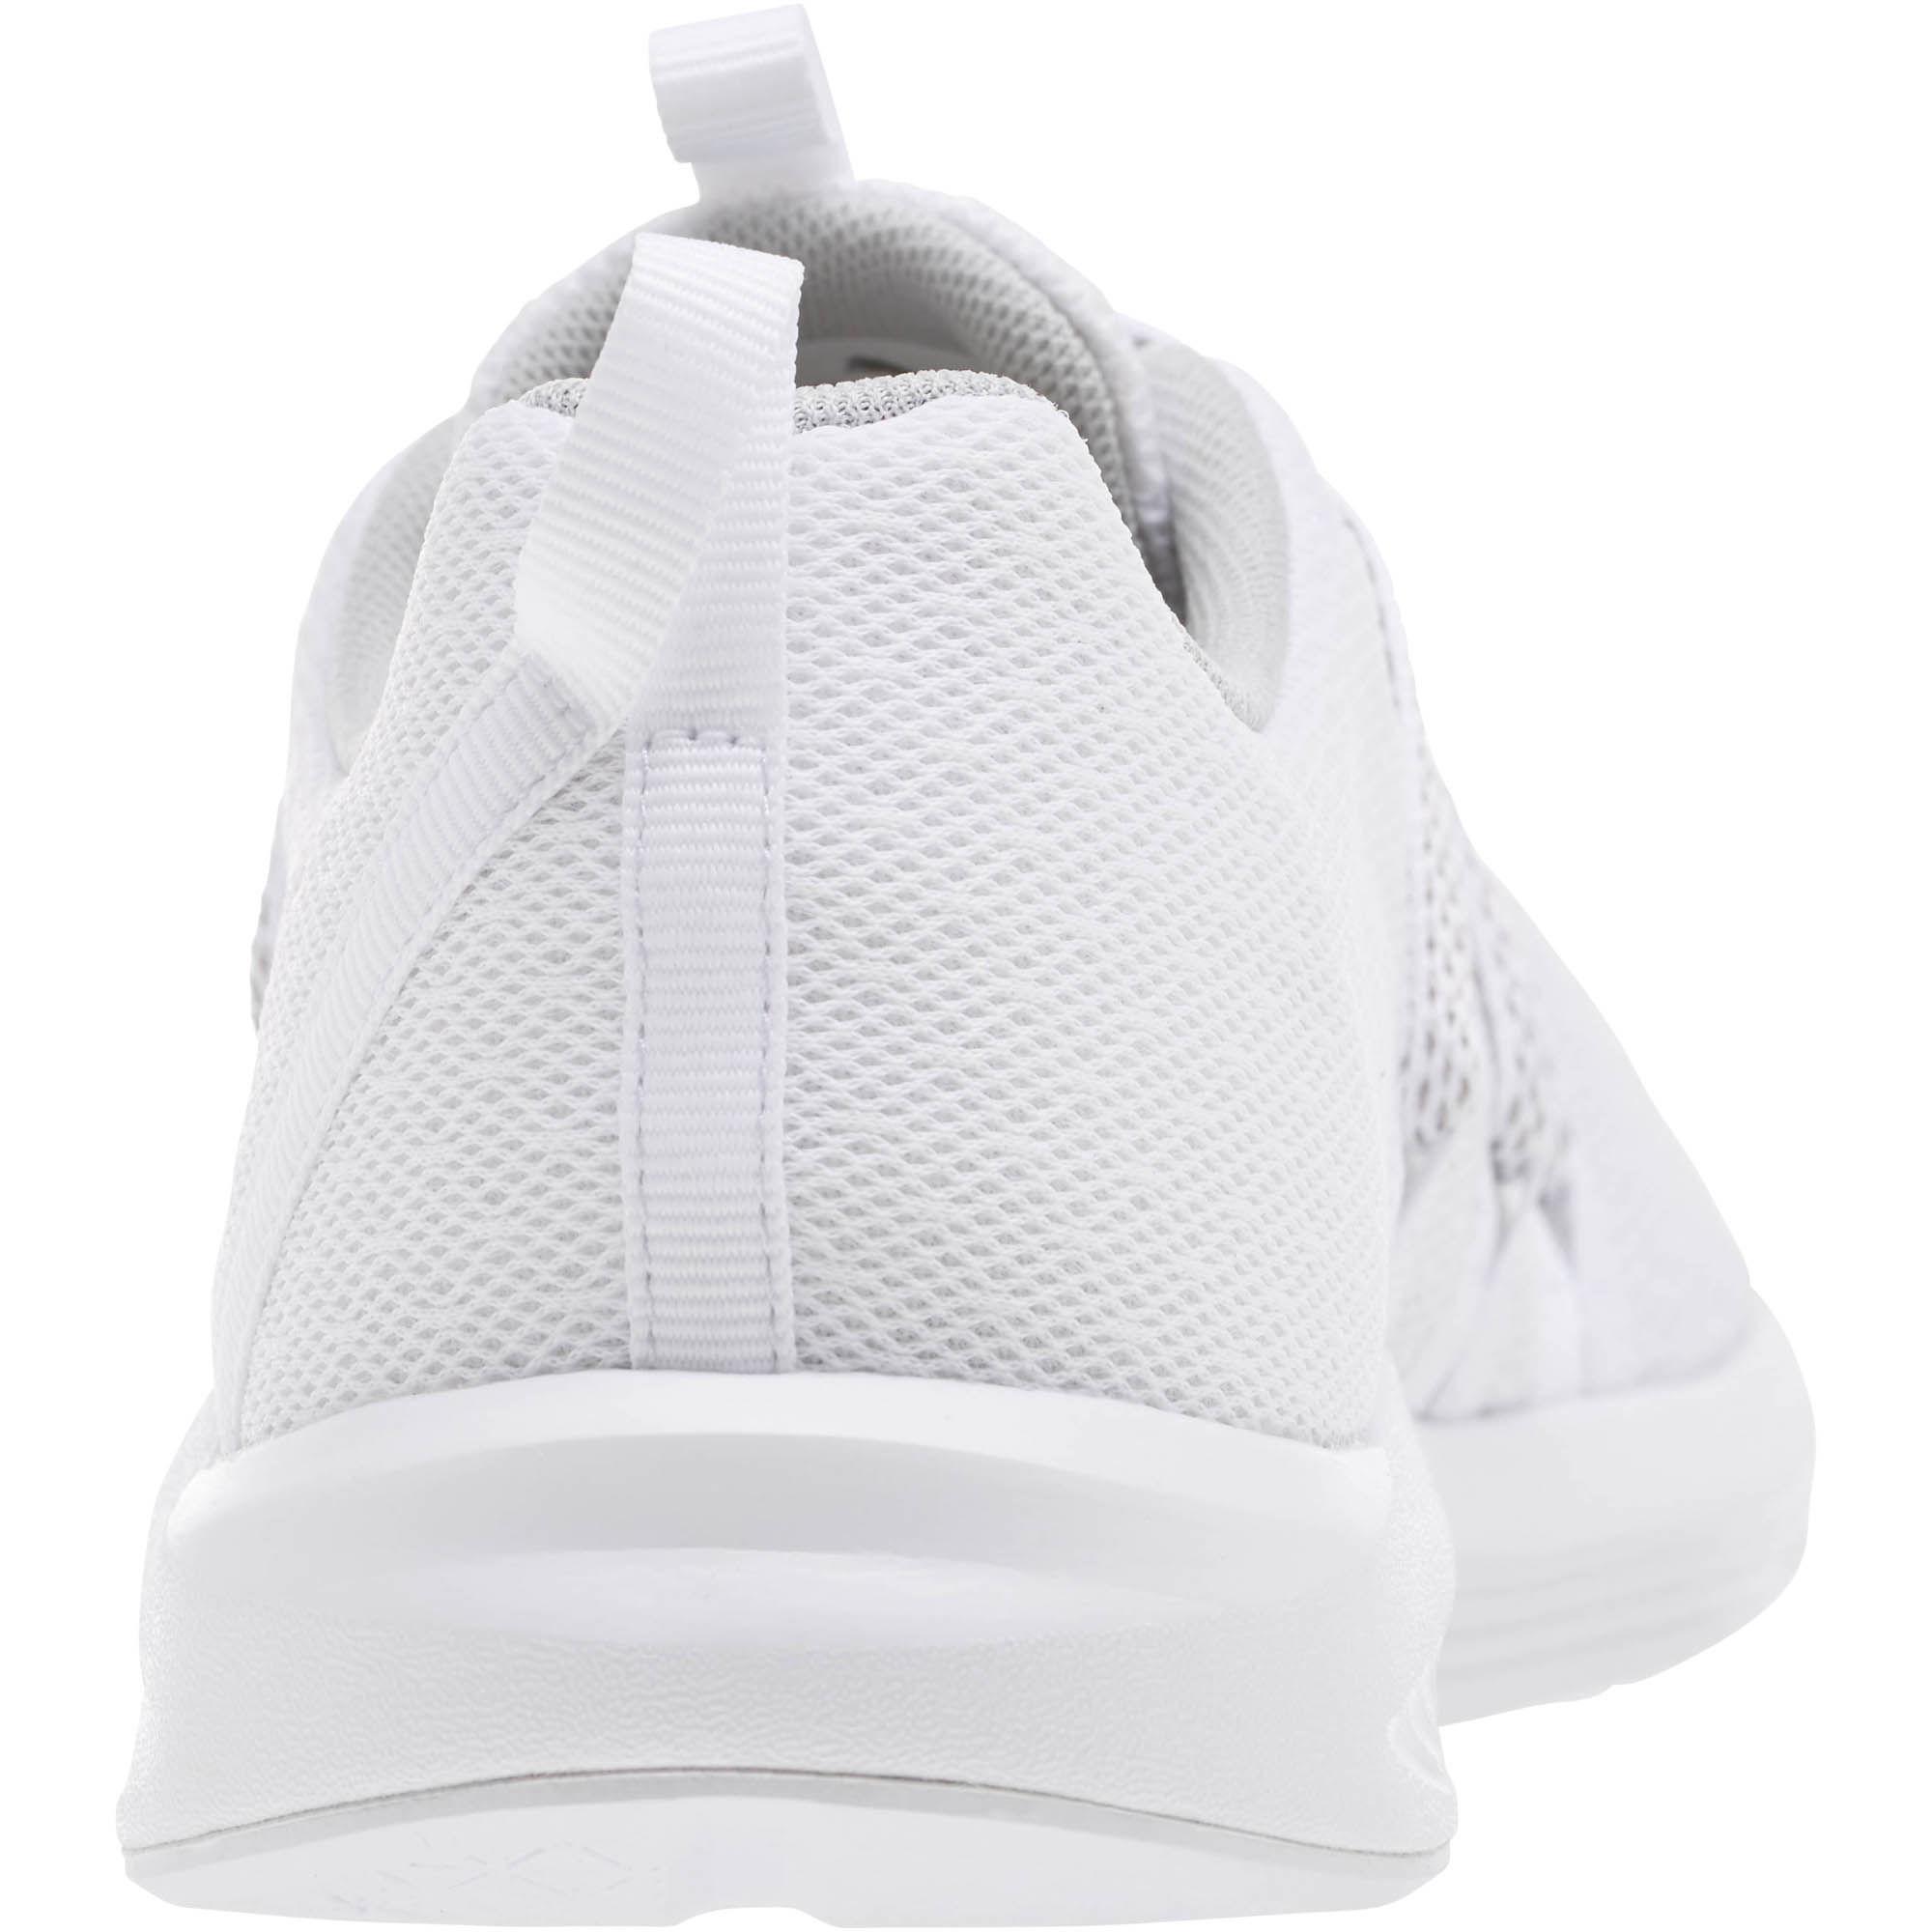 PUMA - White Prowl Alt Knit Mesh Women s Running Shoes - Lyst. View  fullscreen 4416e10da